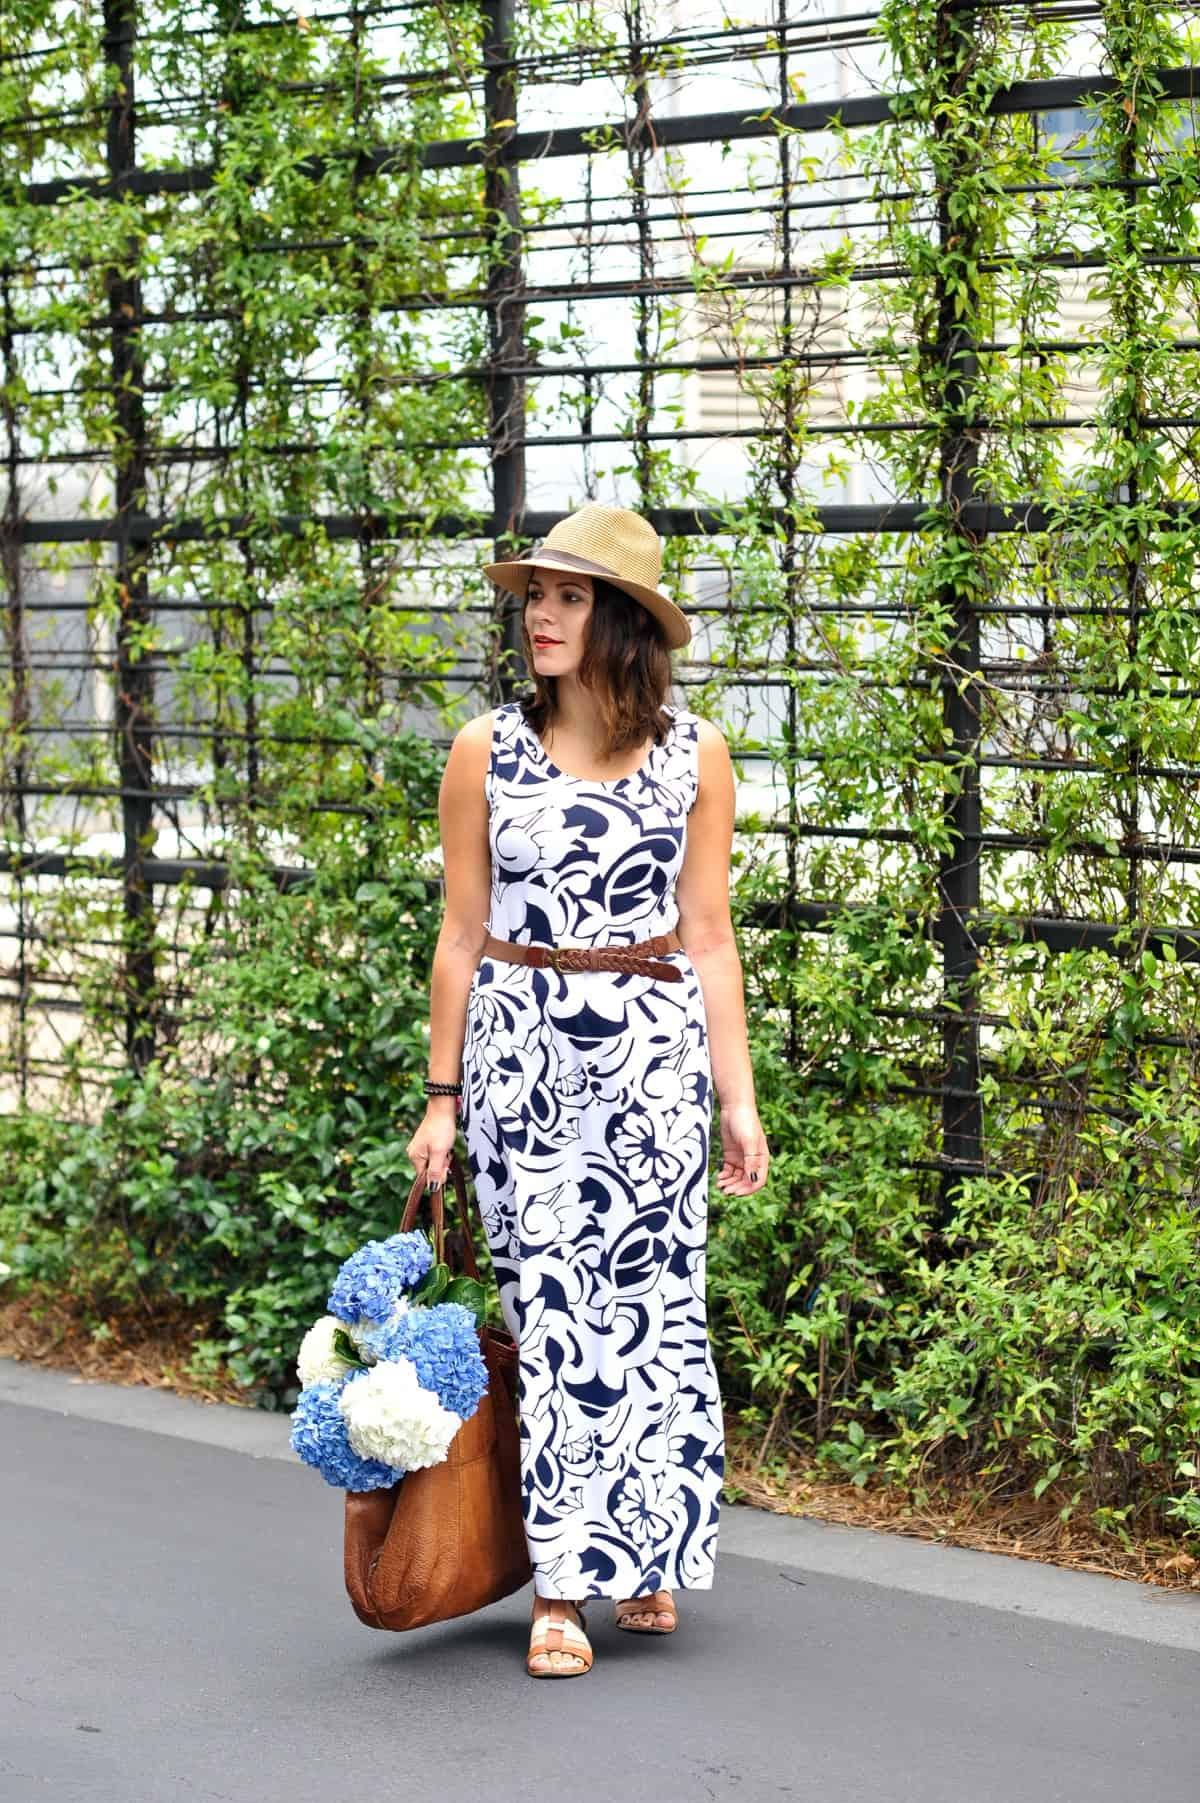 Talbots Printed Maxi Dress for summer via fashion blogger @mystylevita